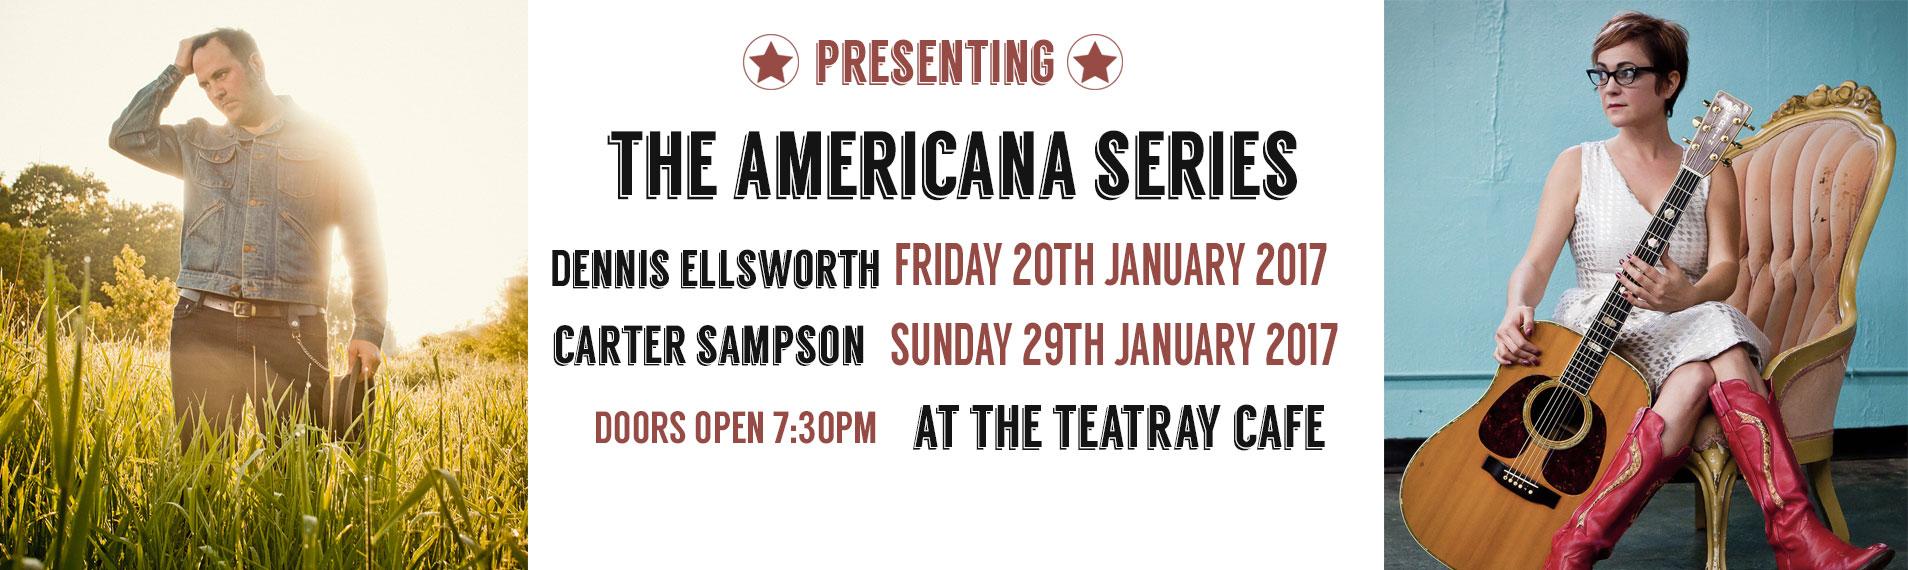 the-americana-series